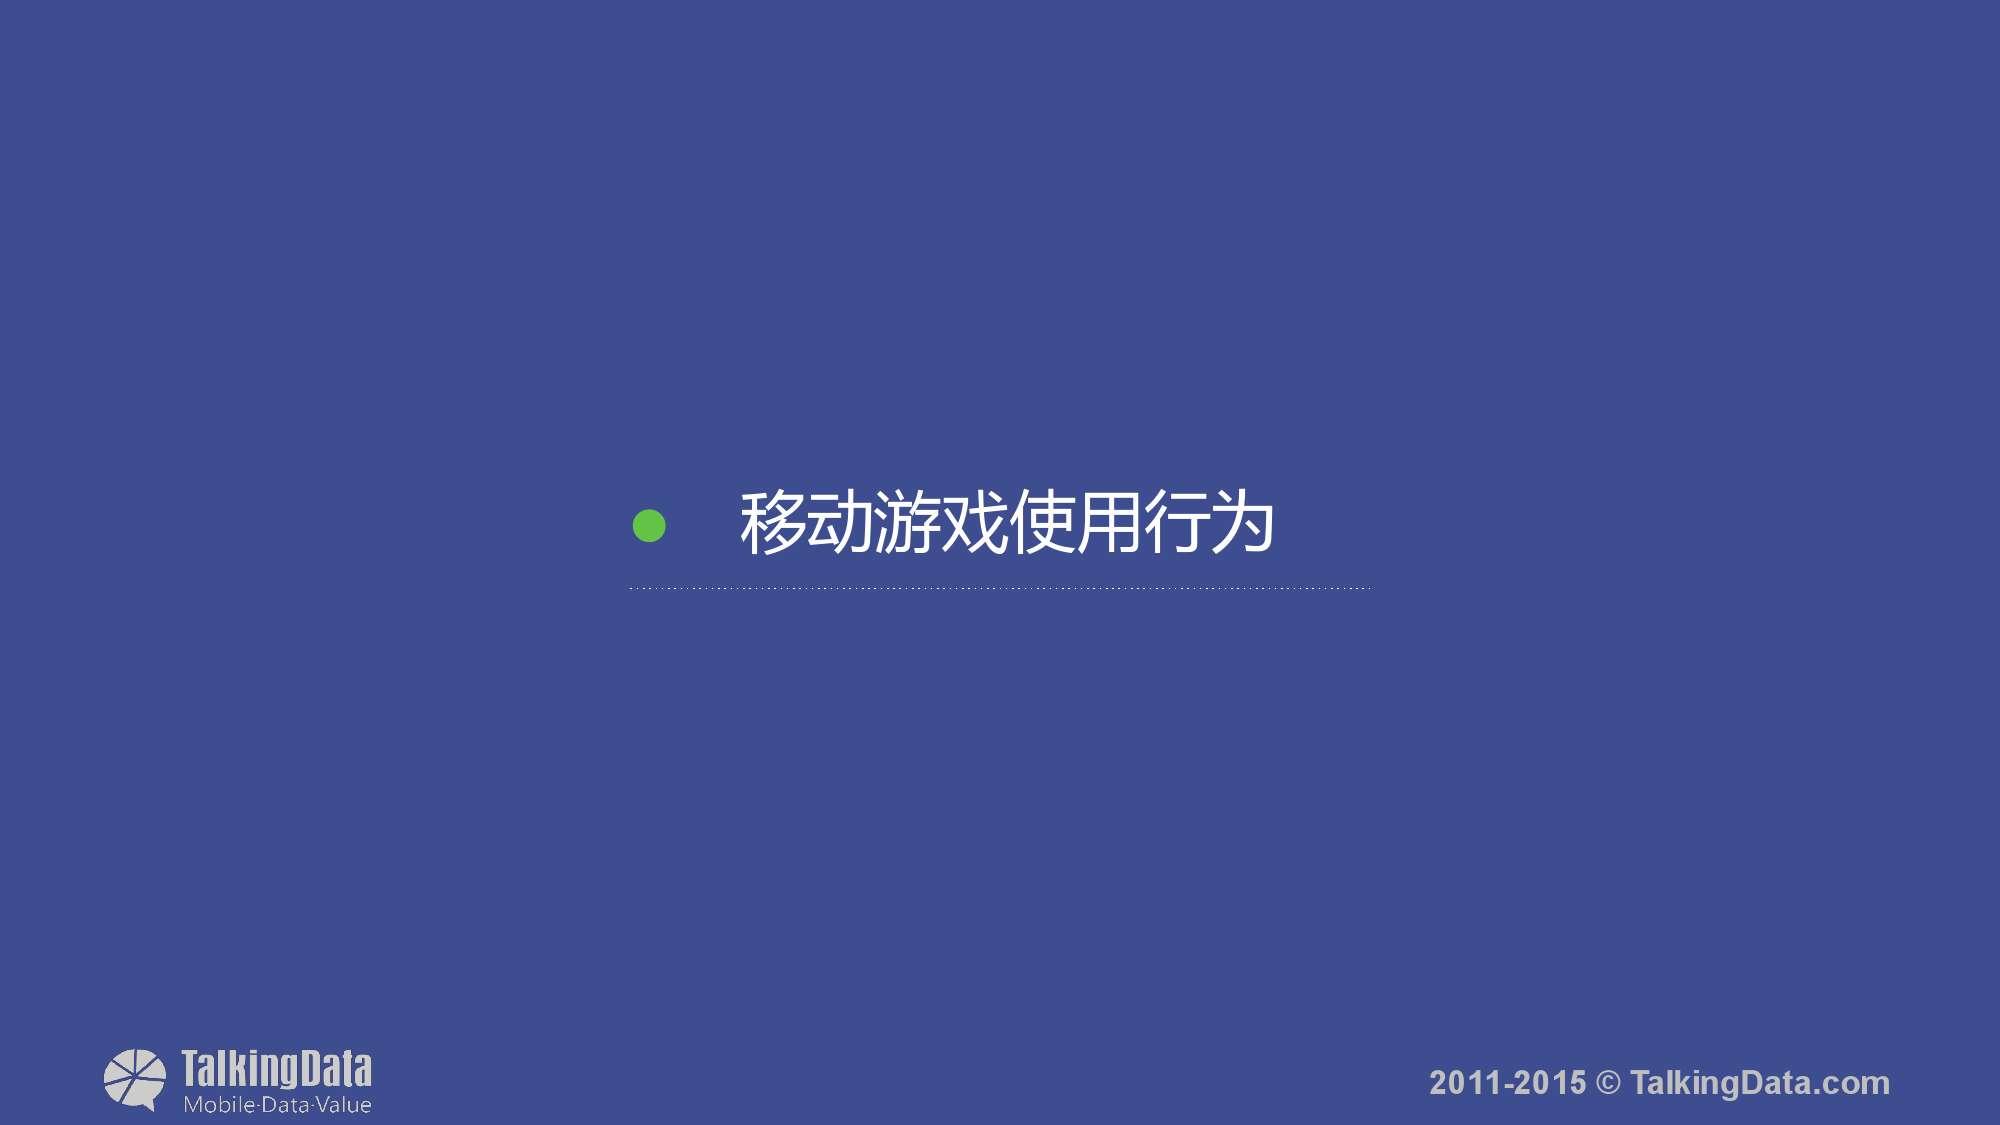 TalkingData-2015年移动游戏行业报告_000025